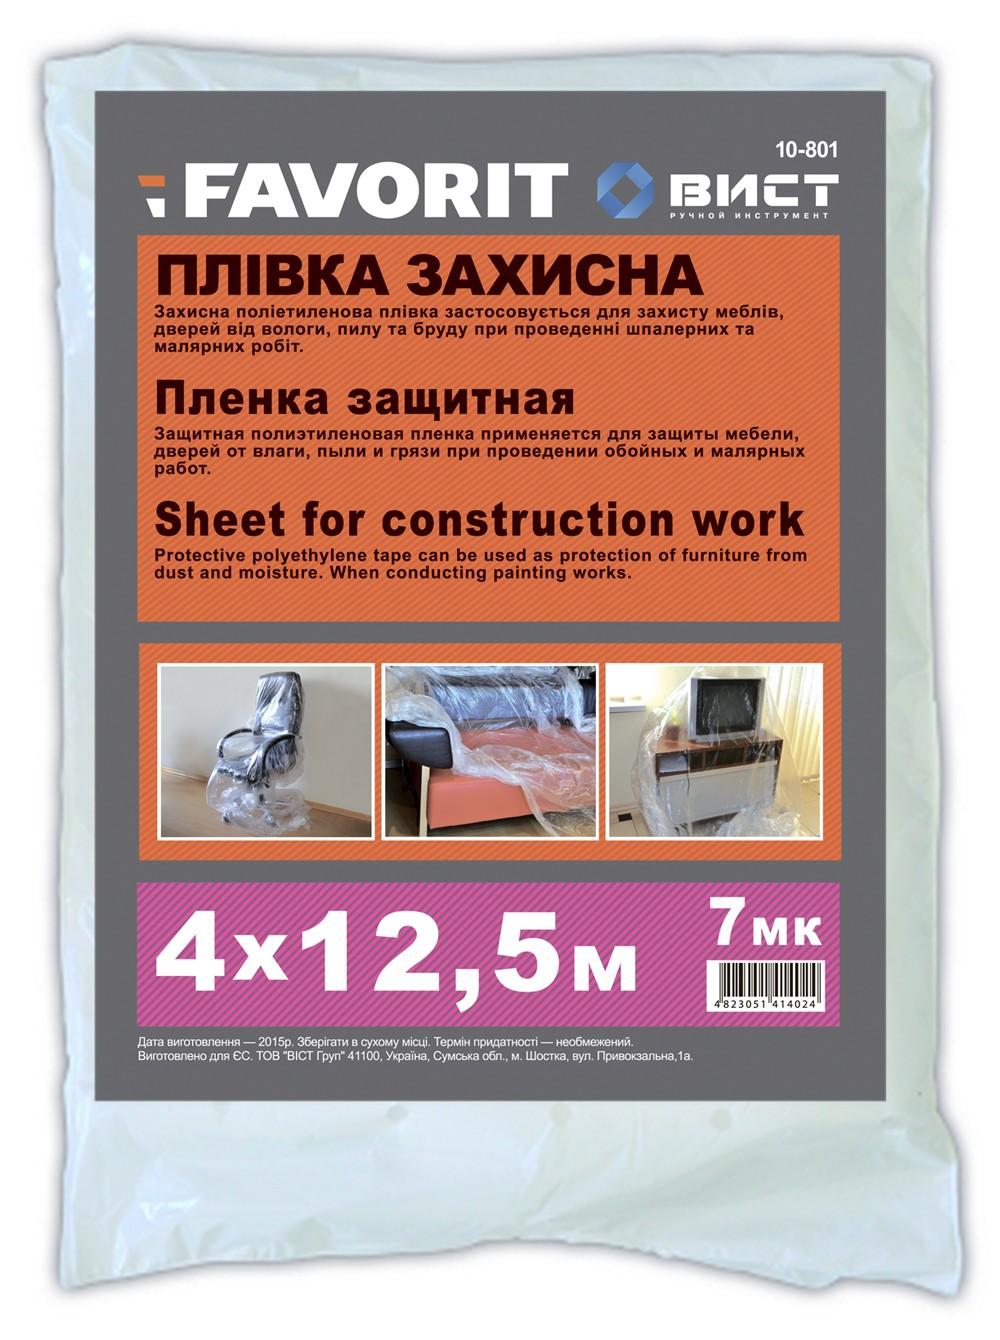 Защитная пленка FAVORIT 4 * 12,5м 7мк 10-801 - PRORAB